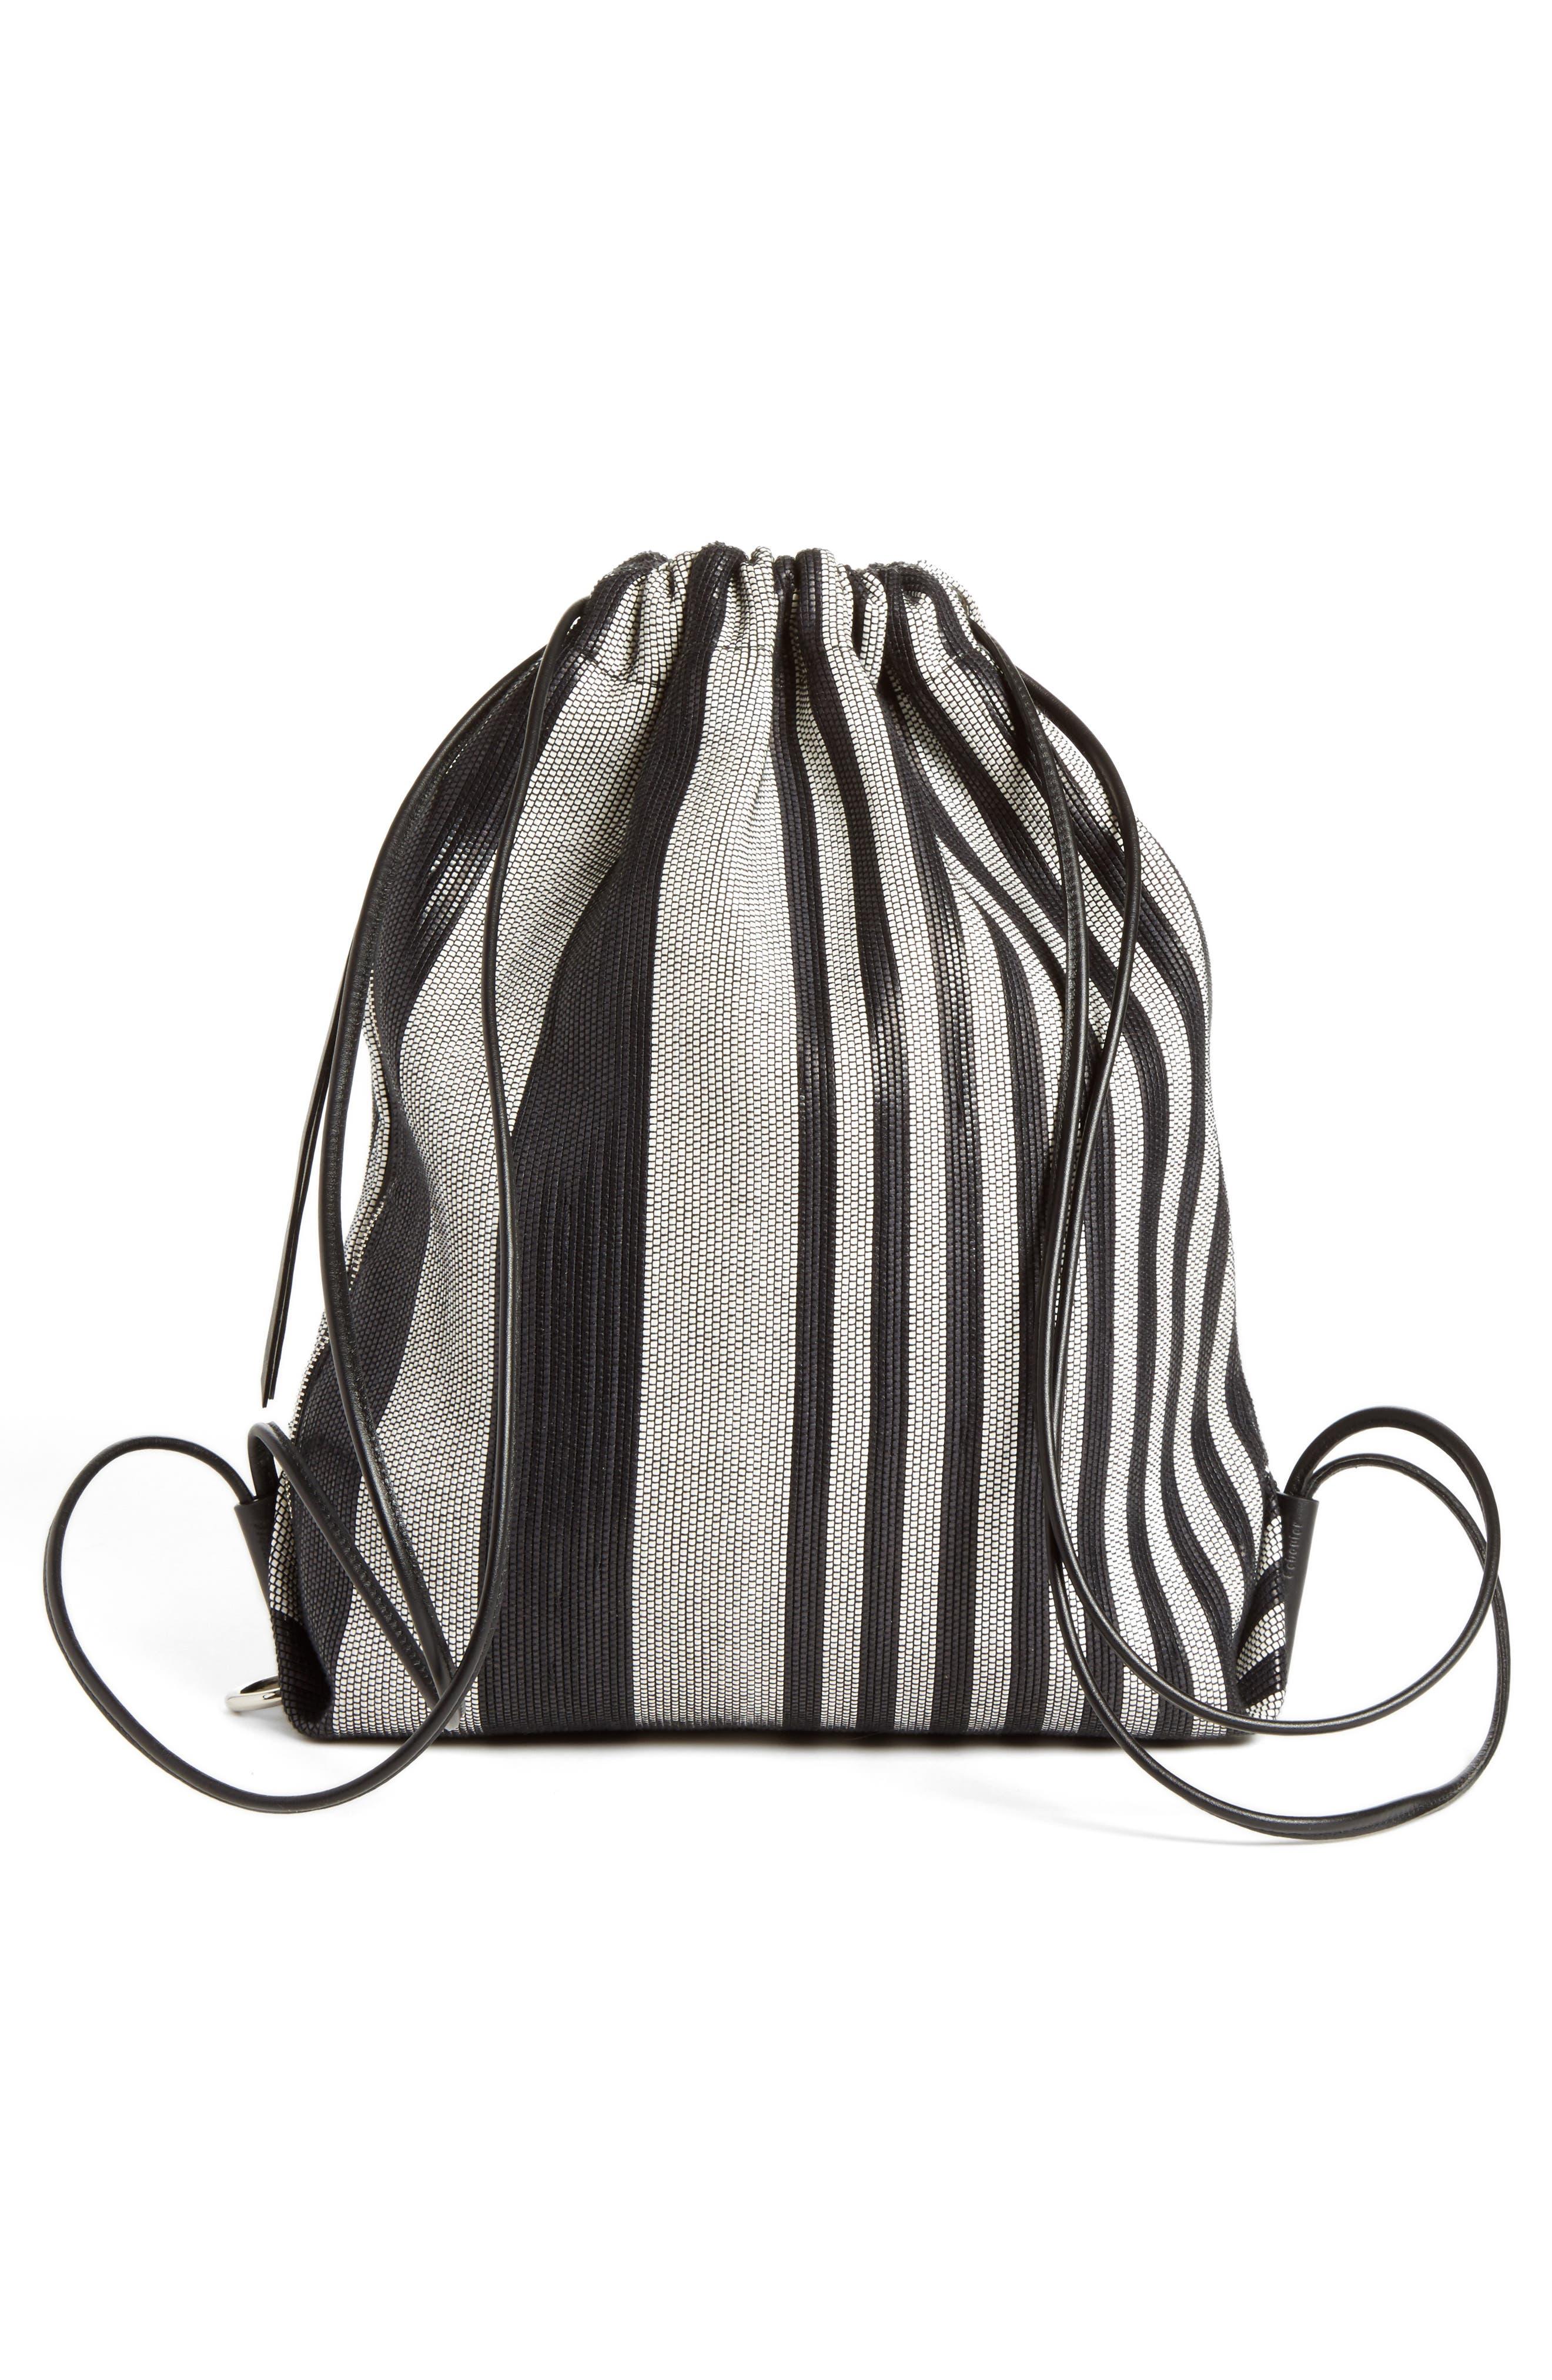 Drawstring Backpack,                         Main,                         color, BLACK/WHITE